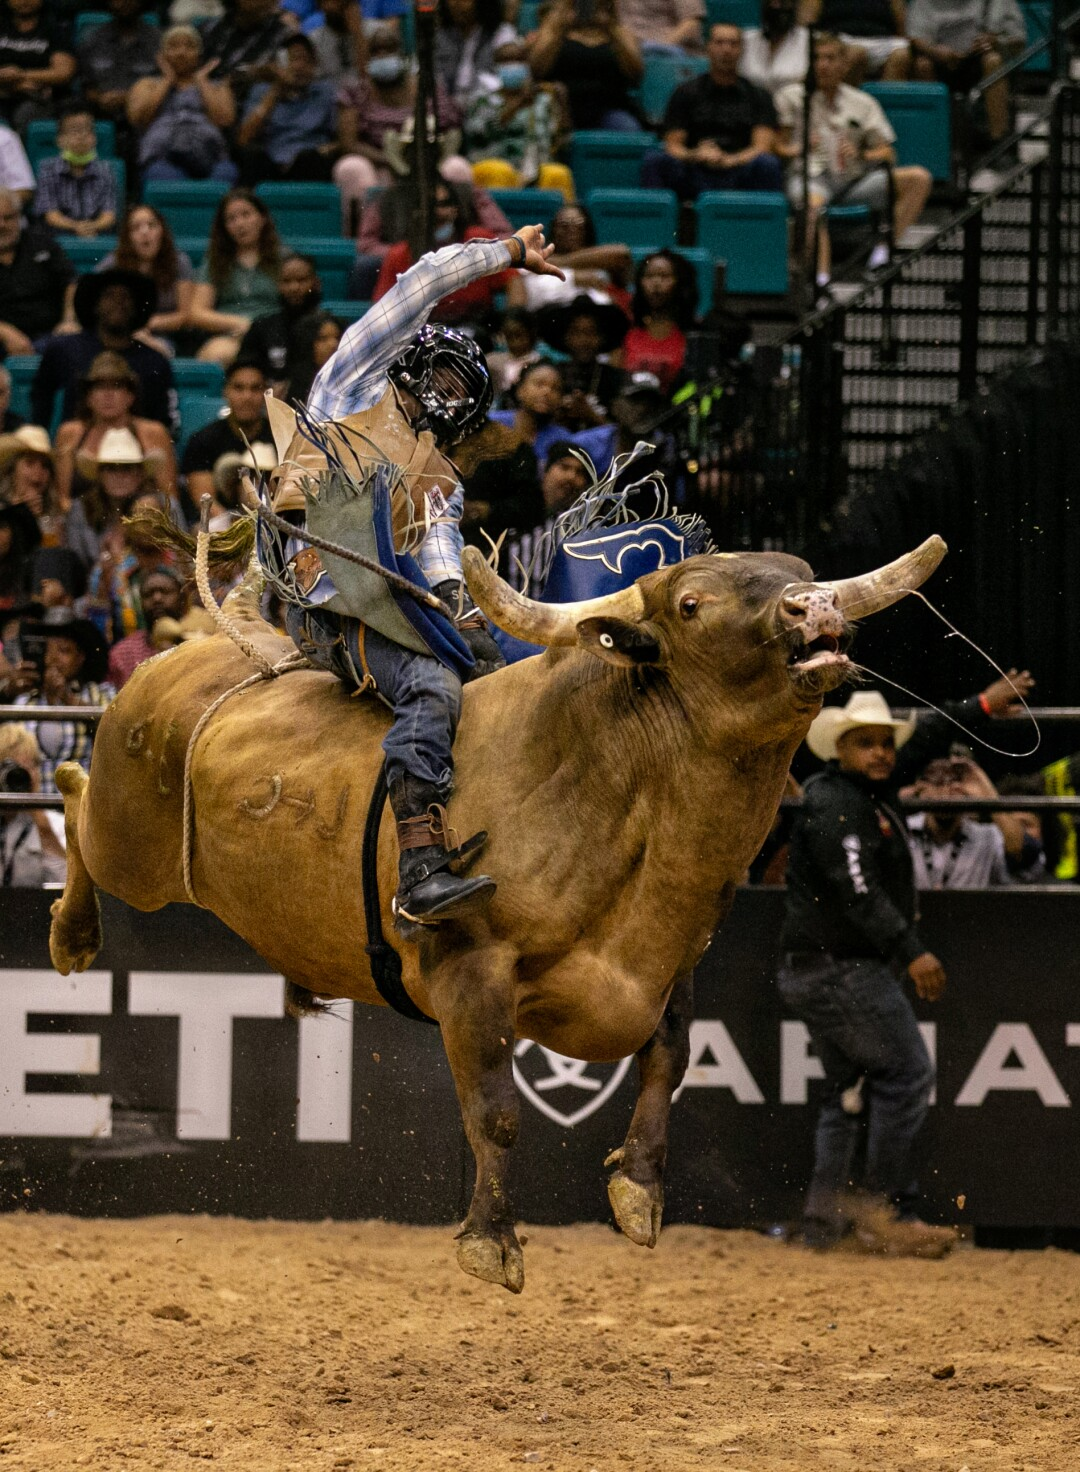 Jamelle Knight rides a bucking bull